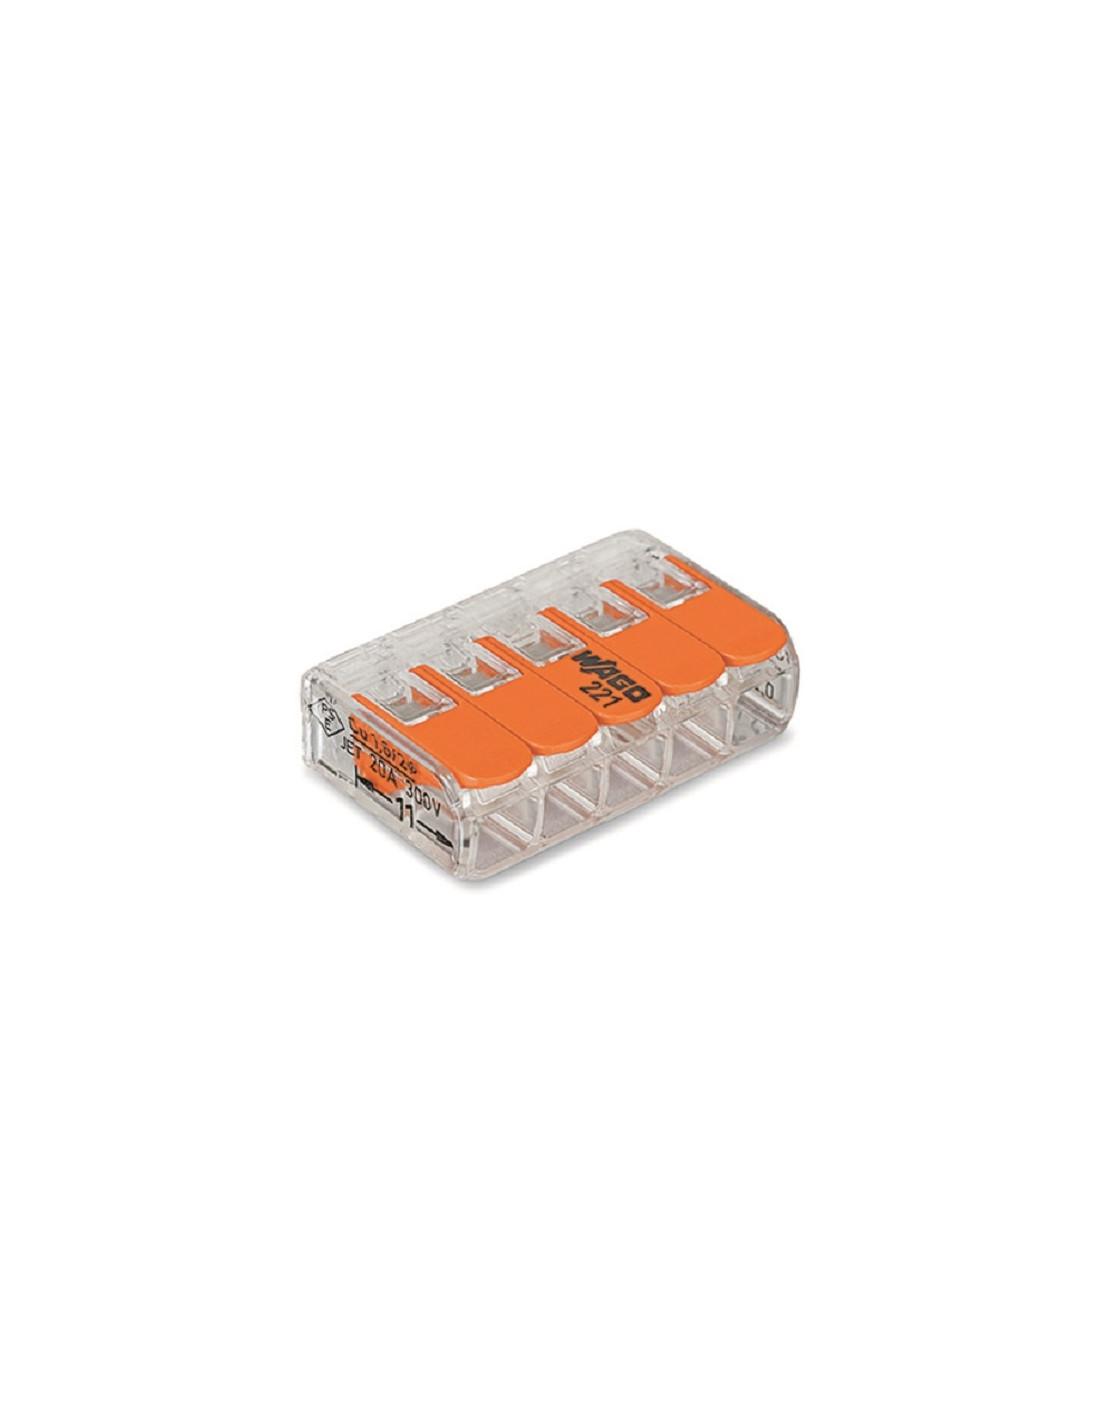 Regleta de empalmes wago 221 de 5 cables tienda de - Regleta para cables ...